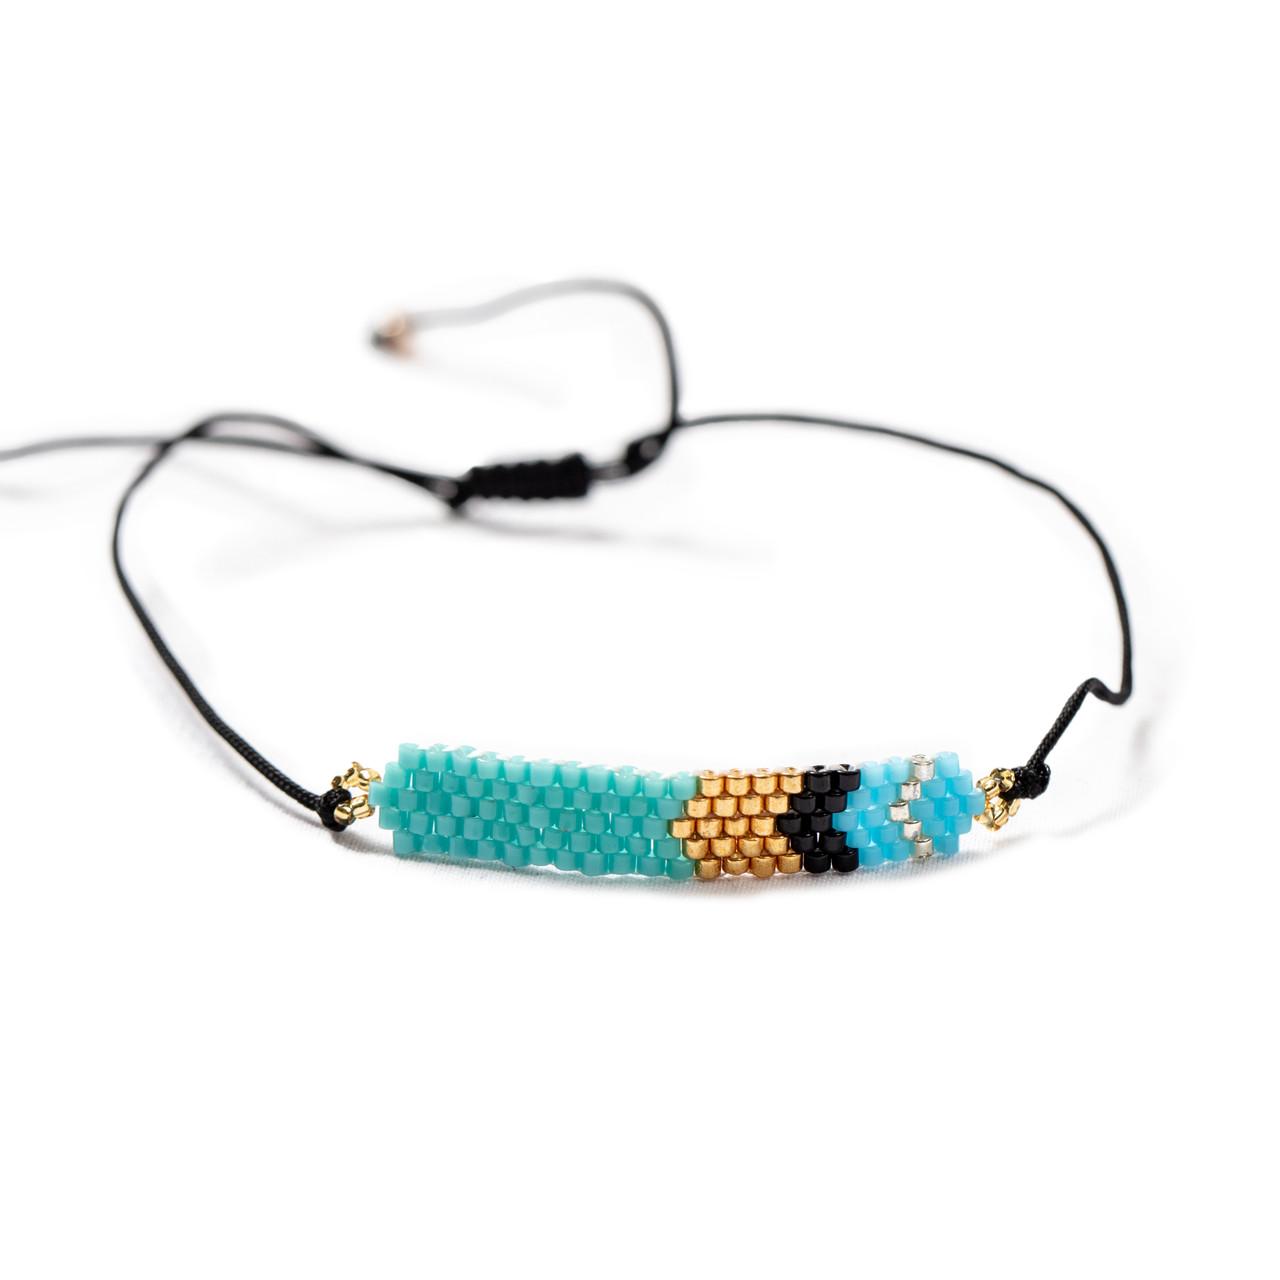 Aqua & Gold Beaded Bracelet